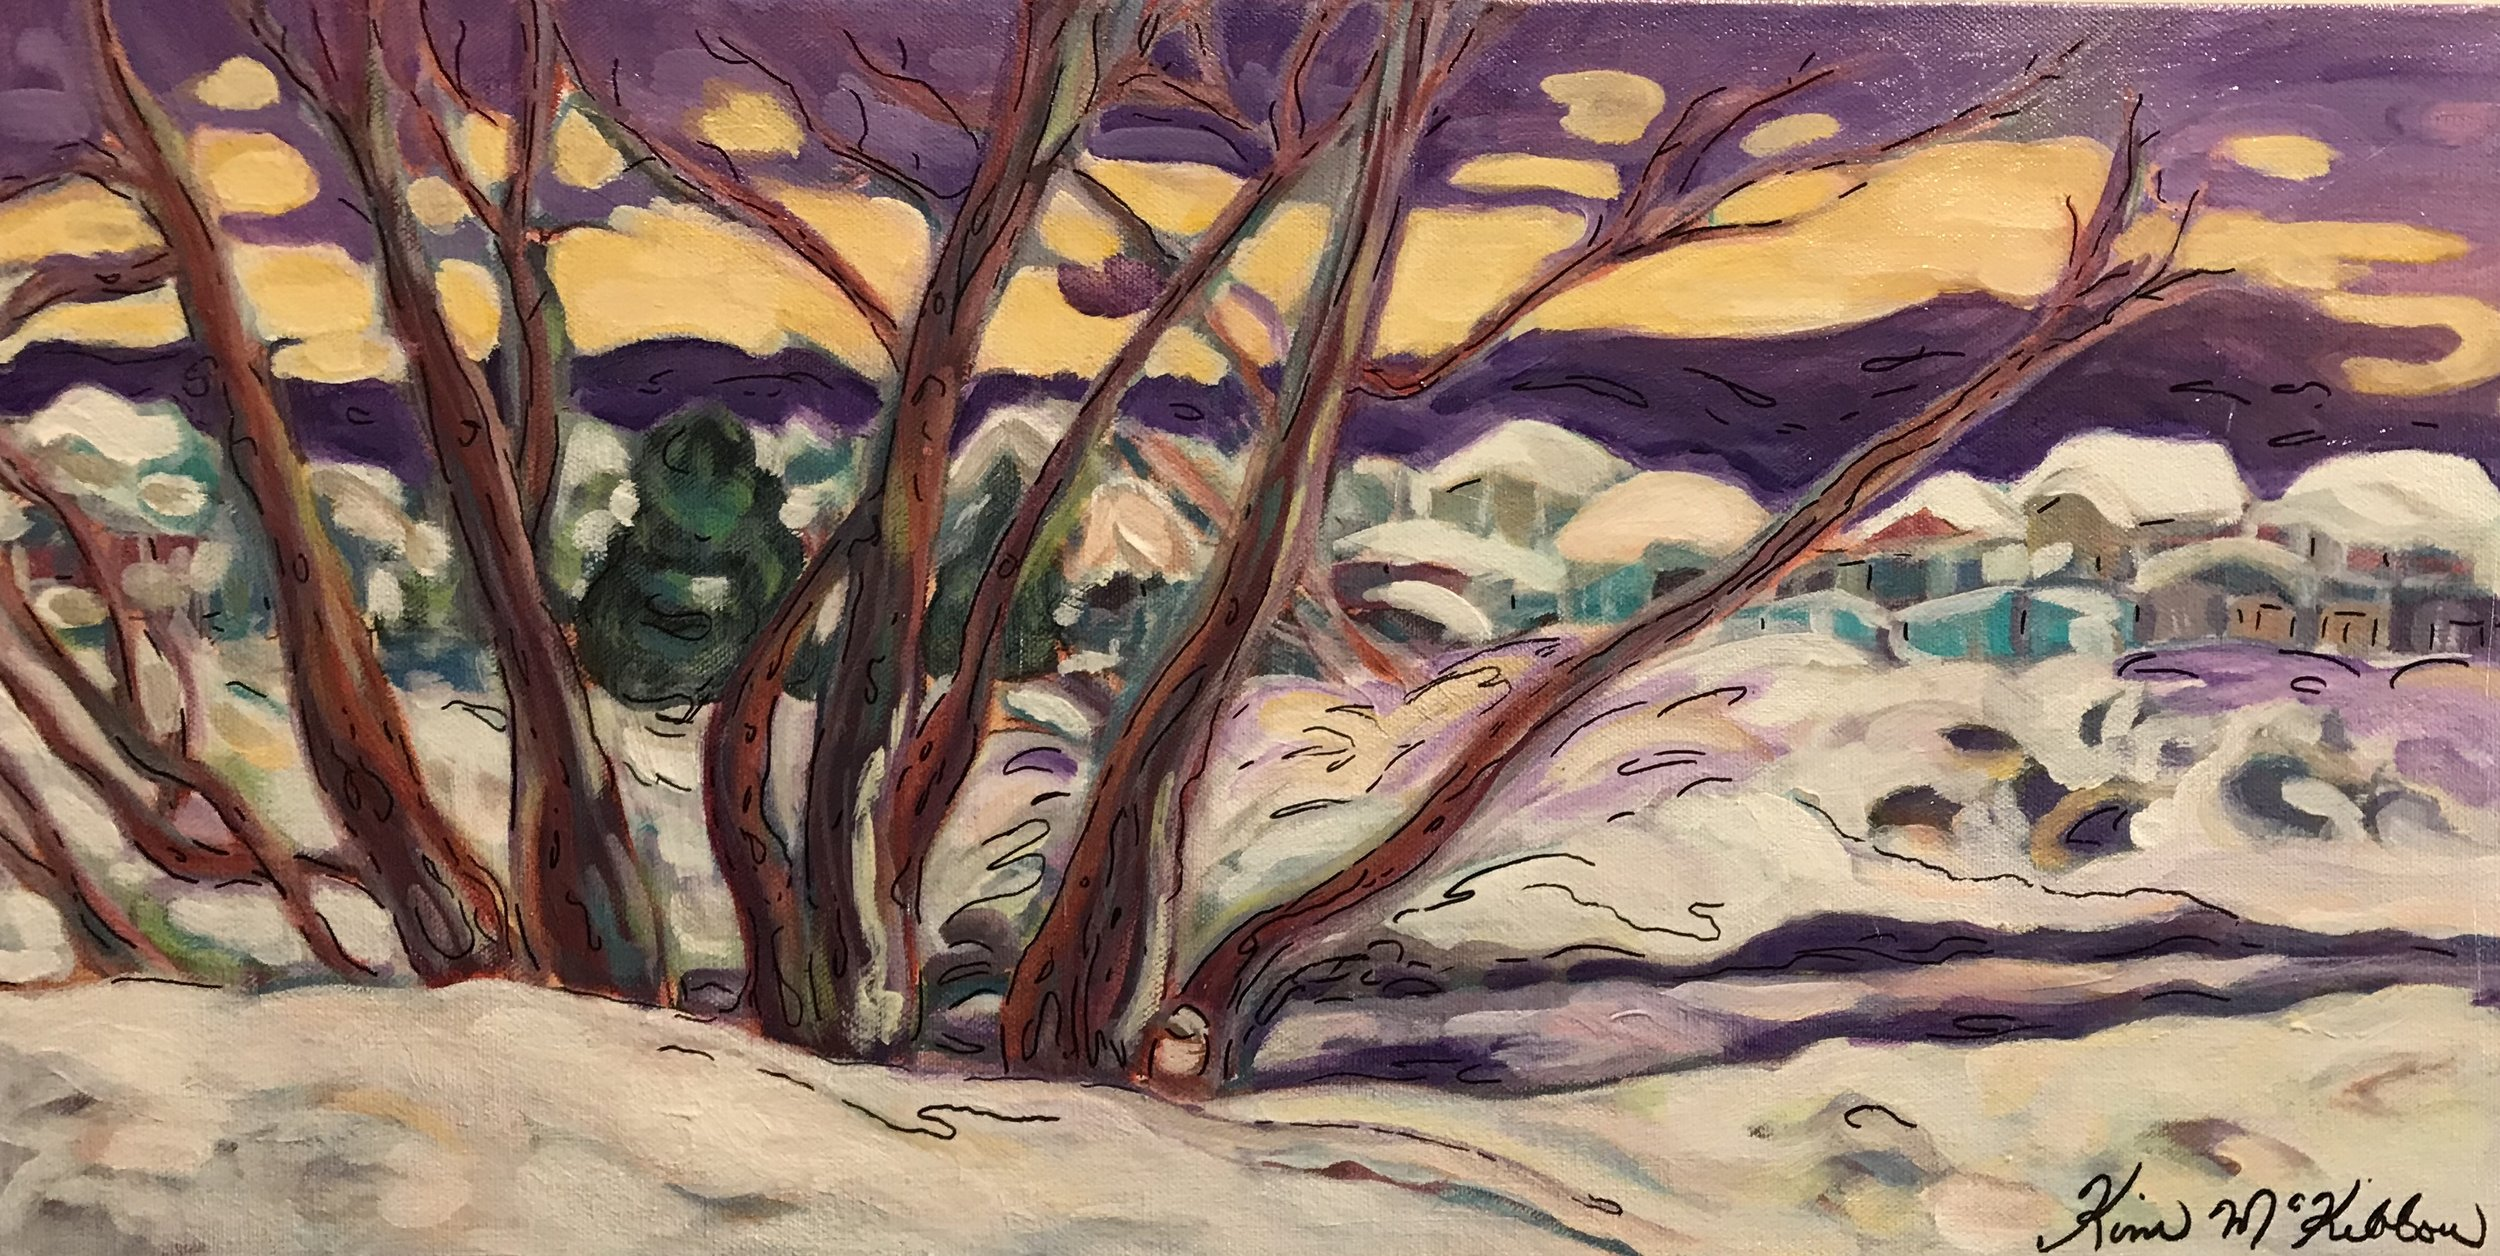 Junction Creek  2 x 1, acrylic on canvas, unframed